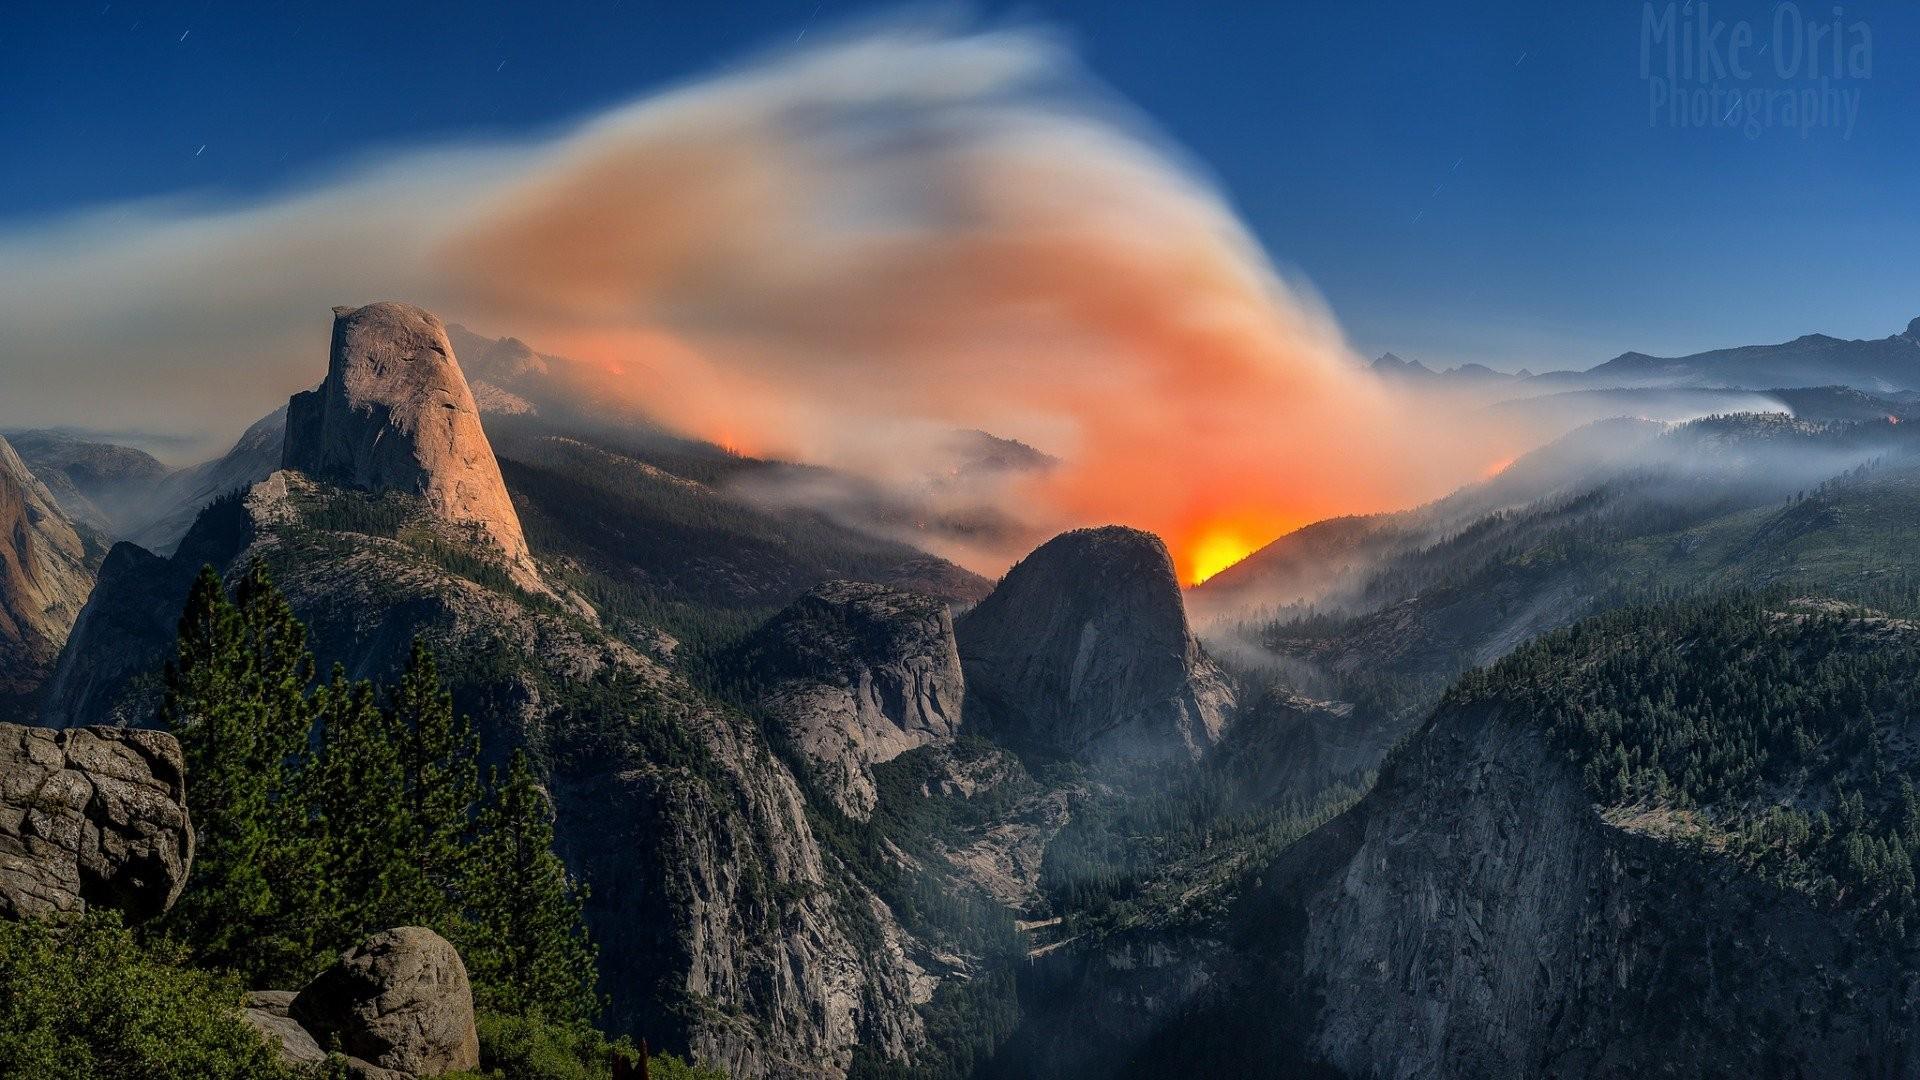 Fall Laptop Wallpaper Yosemite Nature Hd Wallpaper For Pc Desktop Free Download